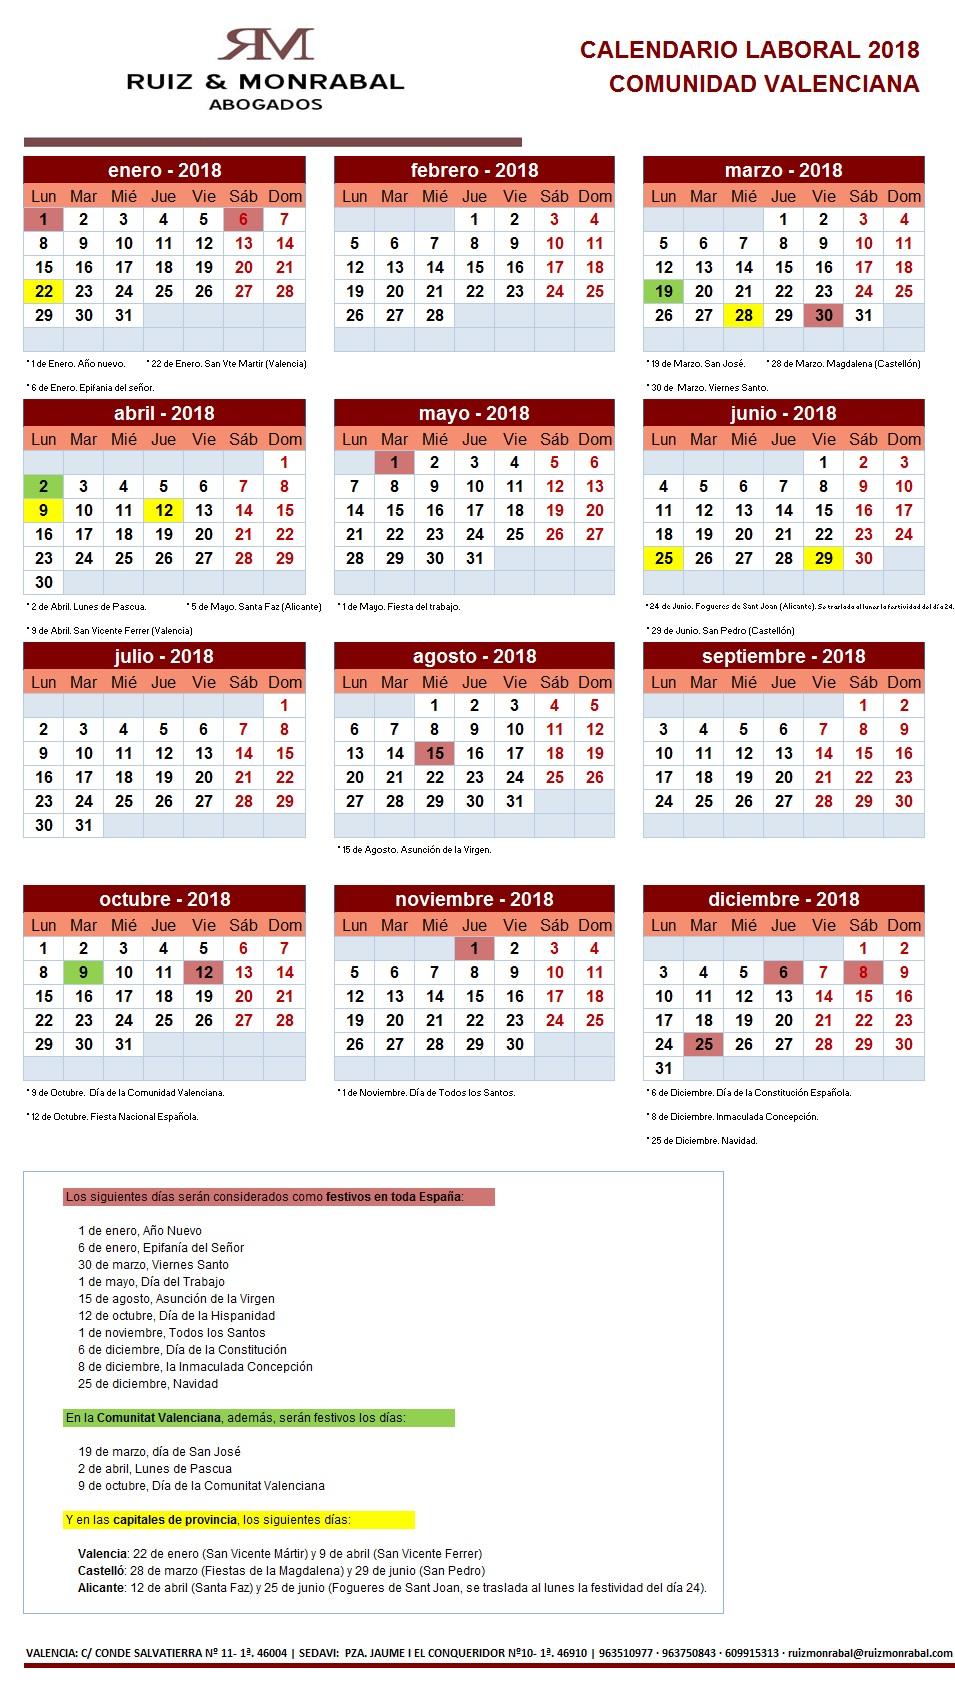 Calendario Laboral De Valencia.Calendario Laboral 2018 En Valencia